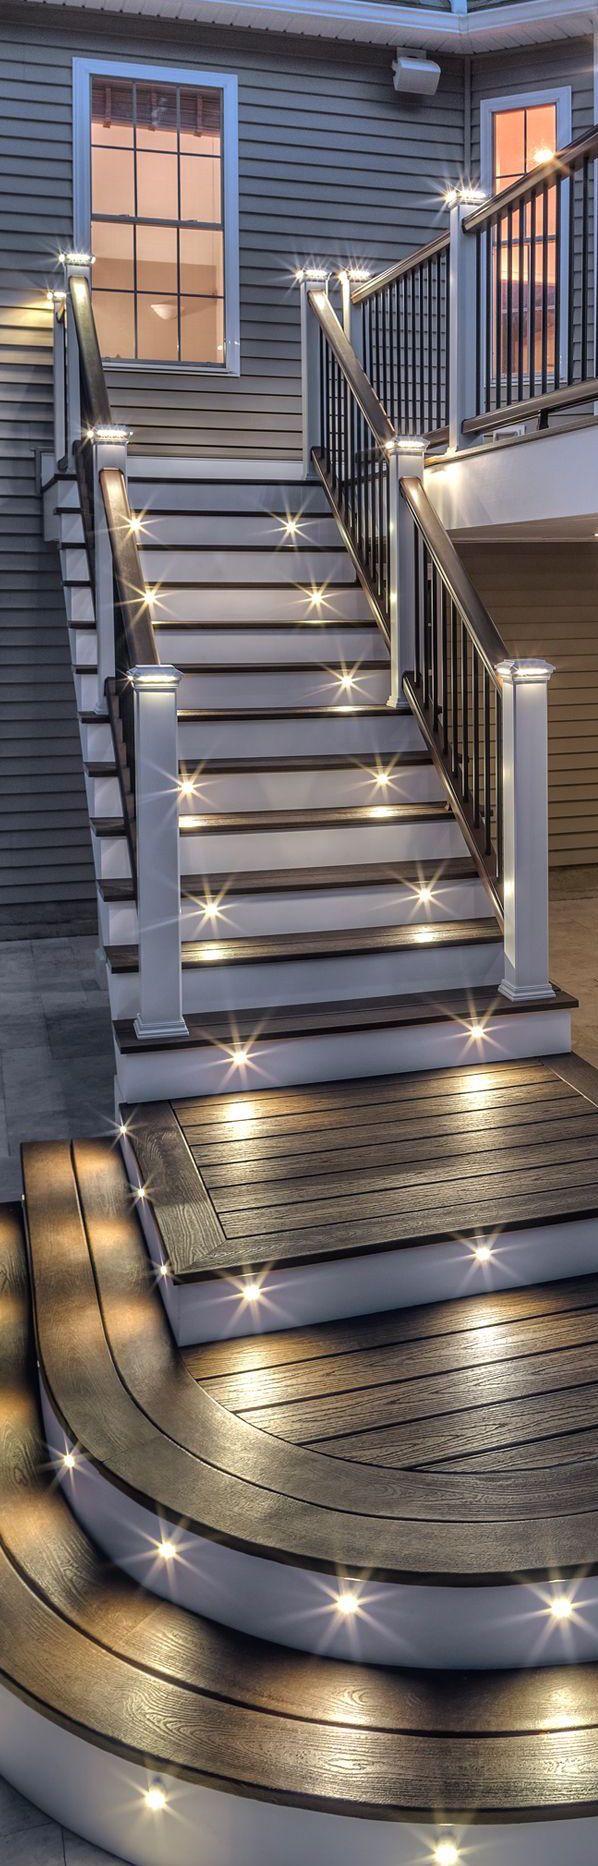 Lighting Basement Washroom Stairs: Best 25+ Deck Steps Ideas On Pinterest